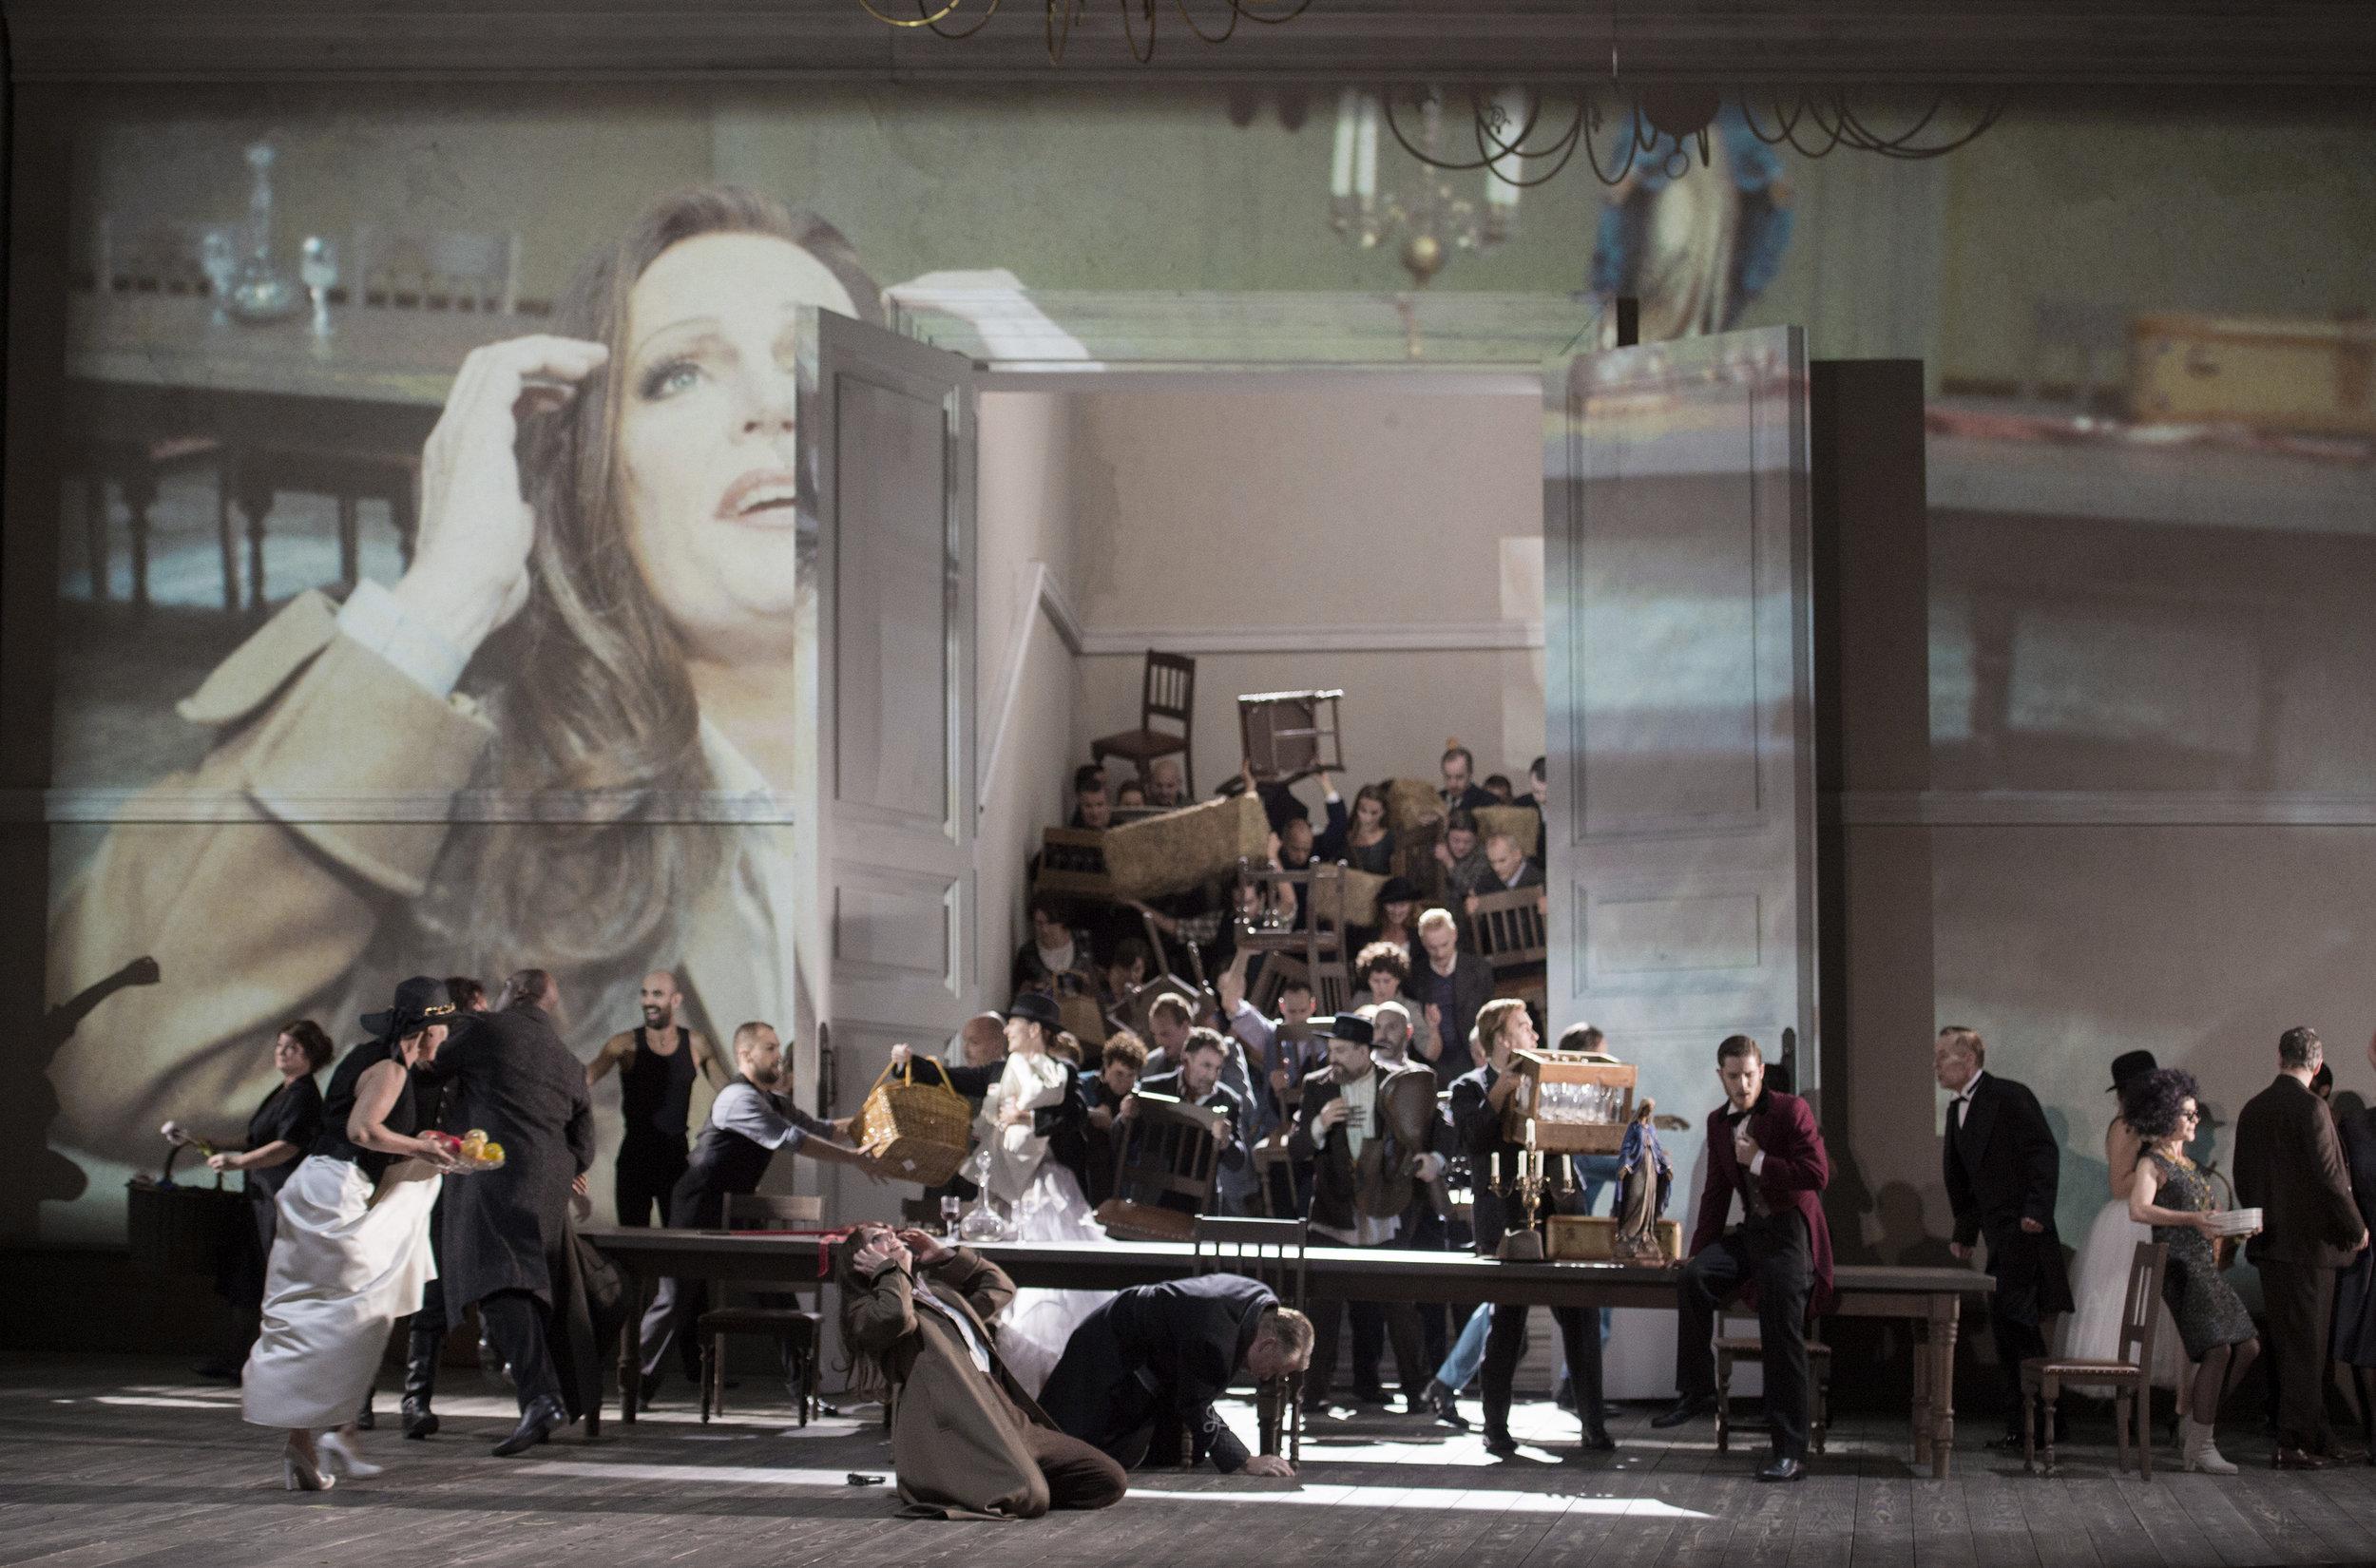 forza_253 La forza del destino at Dutch National Opera (C) Monika Rittershaus.jpg